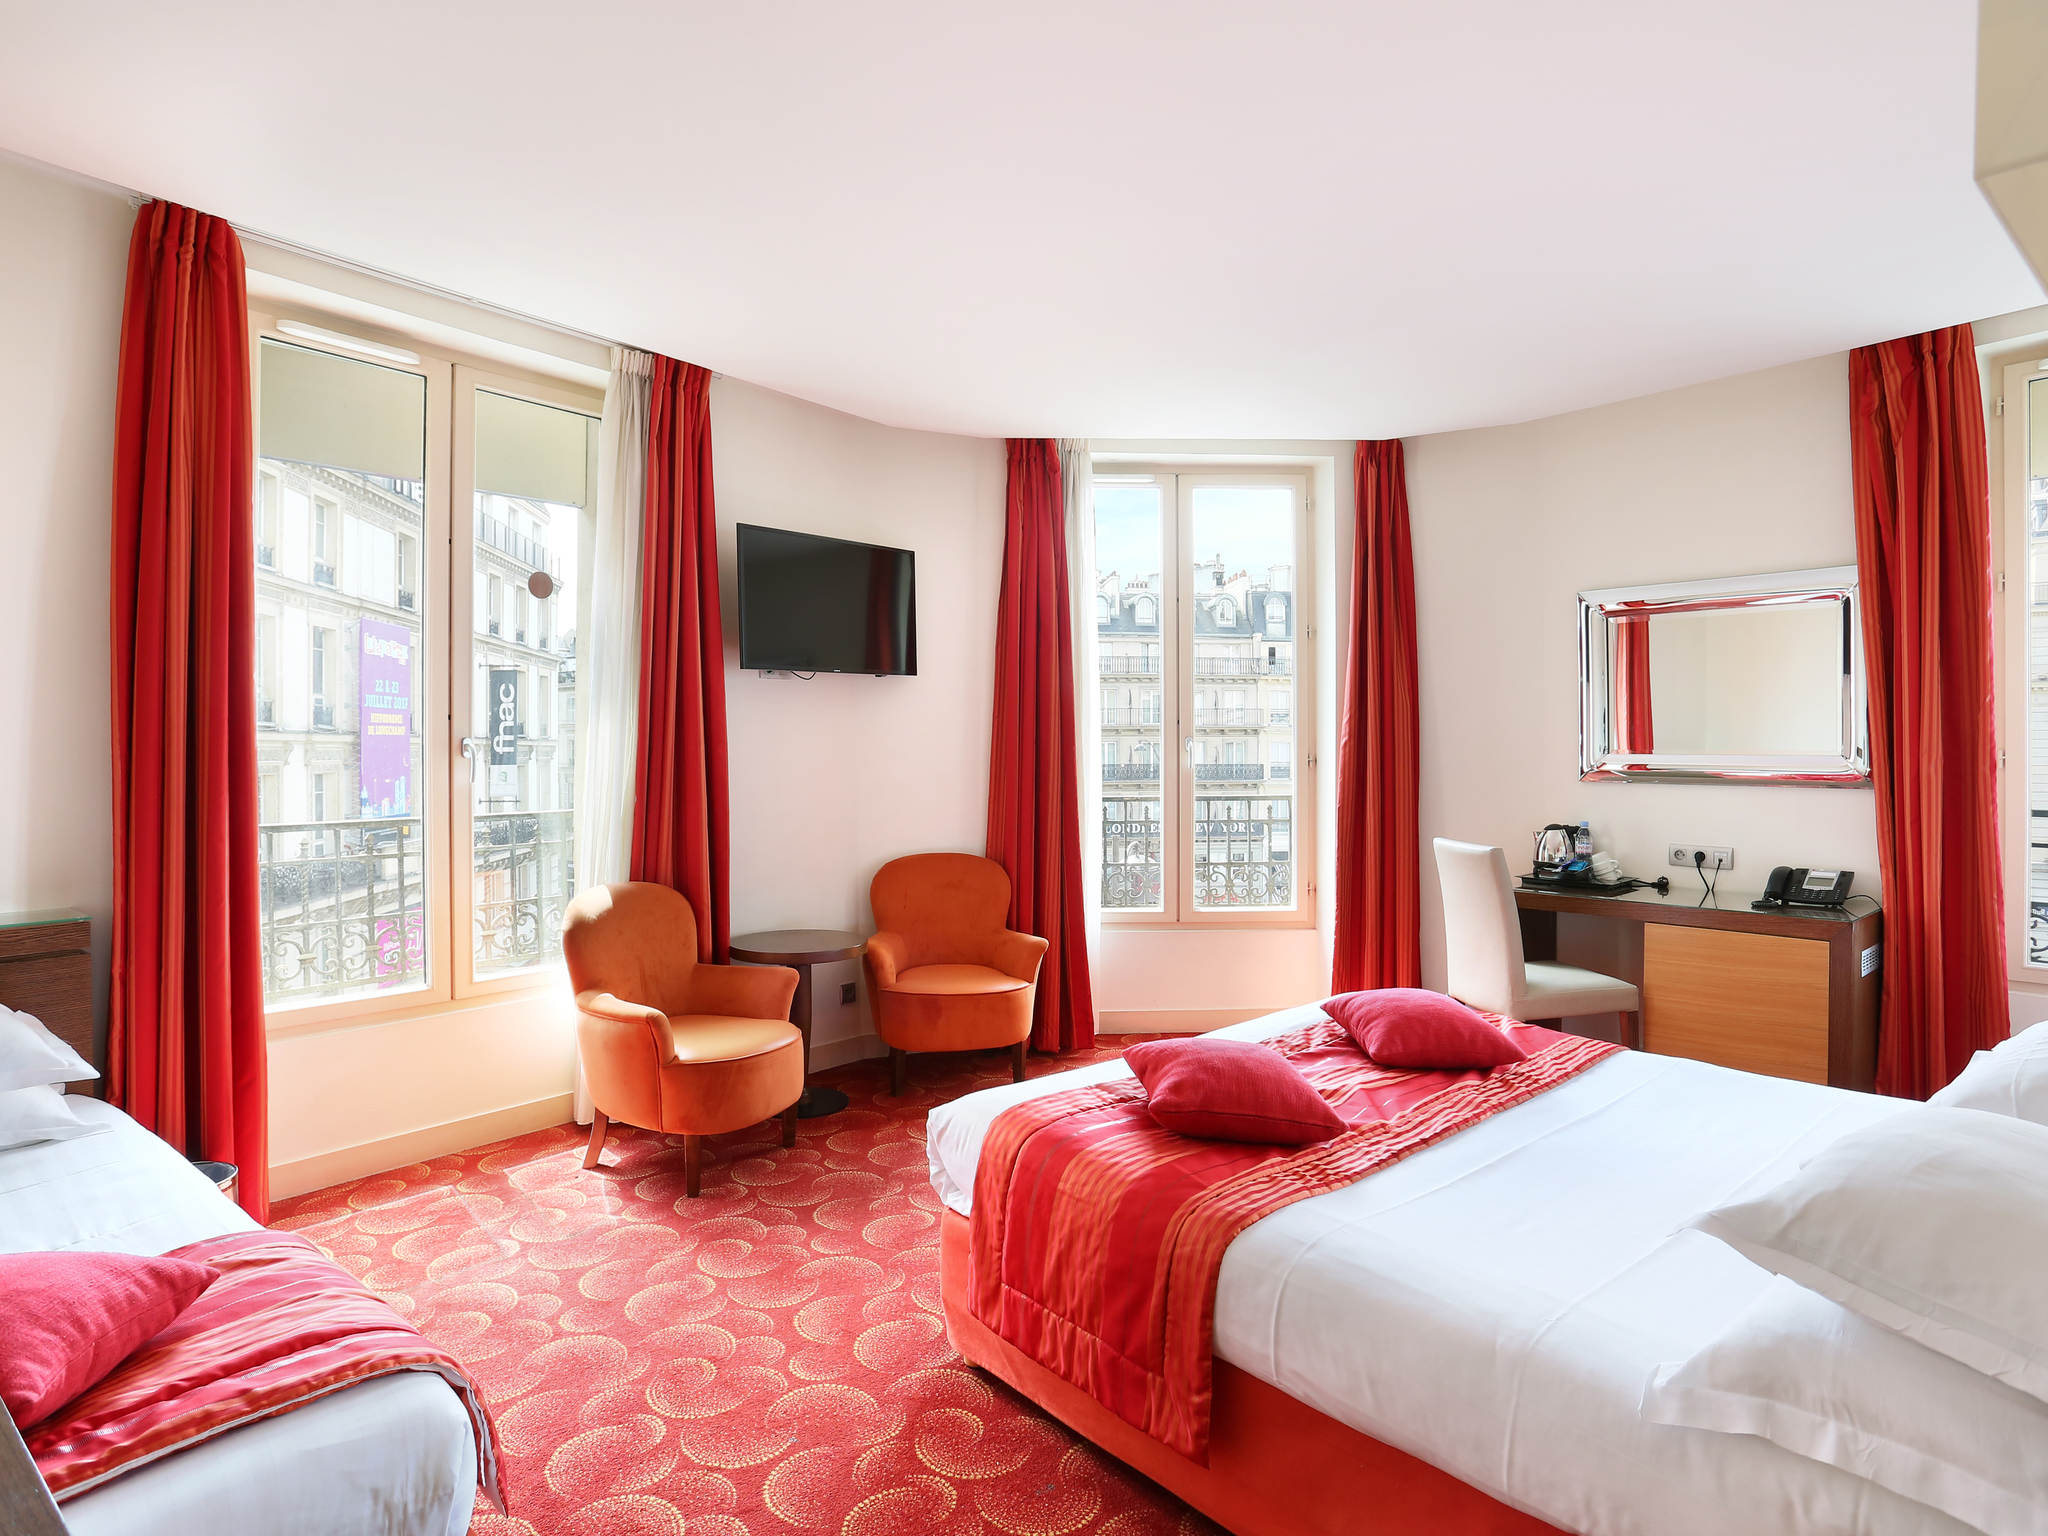 hotel in paris le grand hotel de normandie. Black Bedroom Furniture Sets. Home Design Ideas